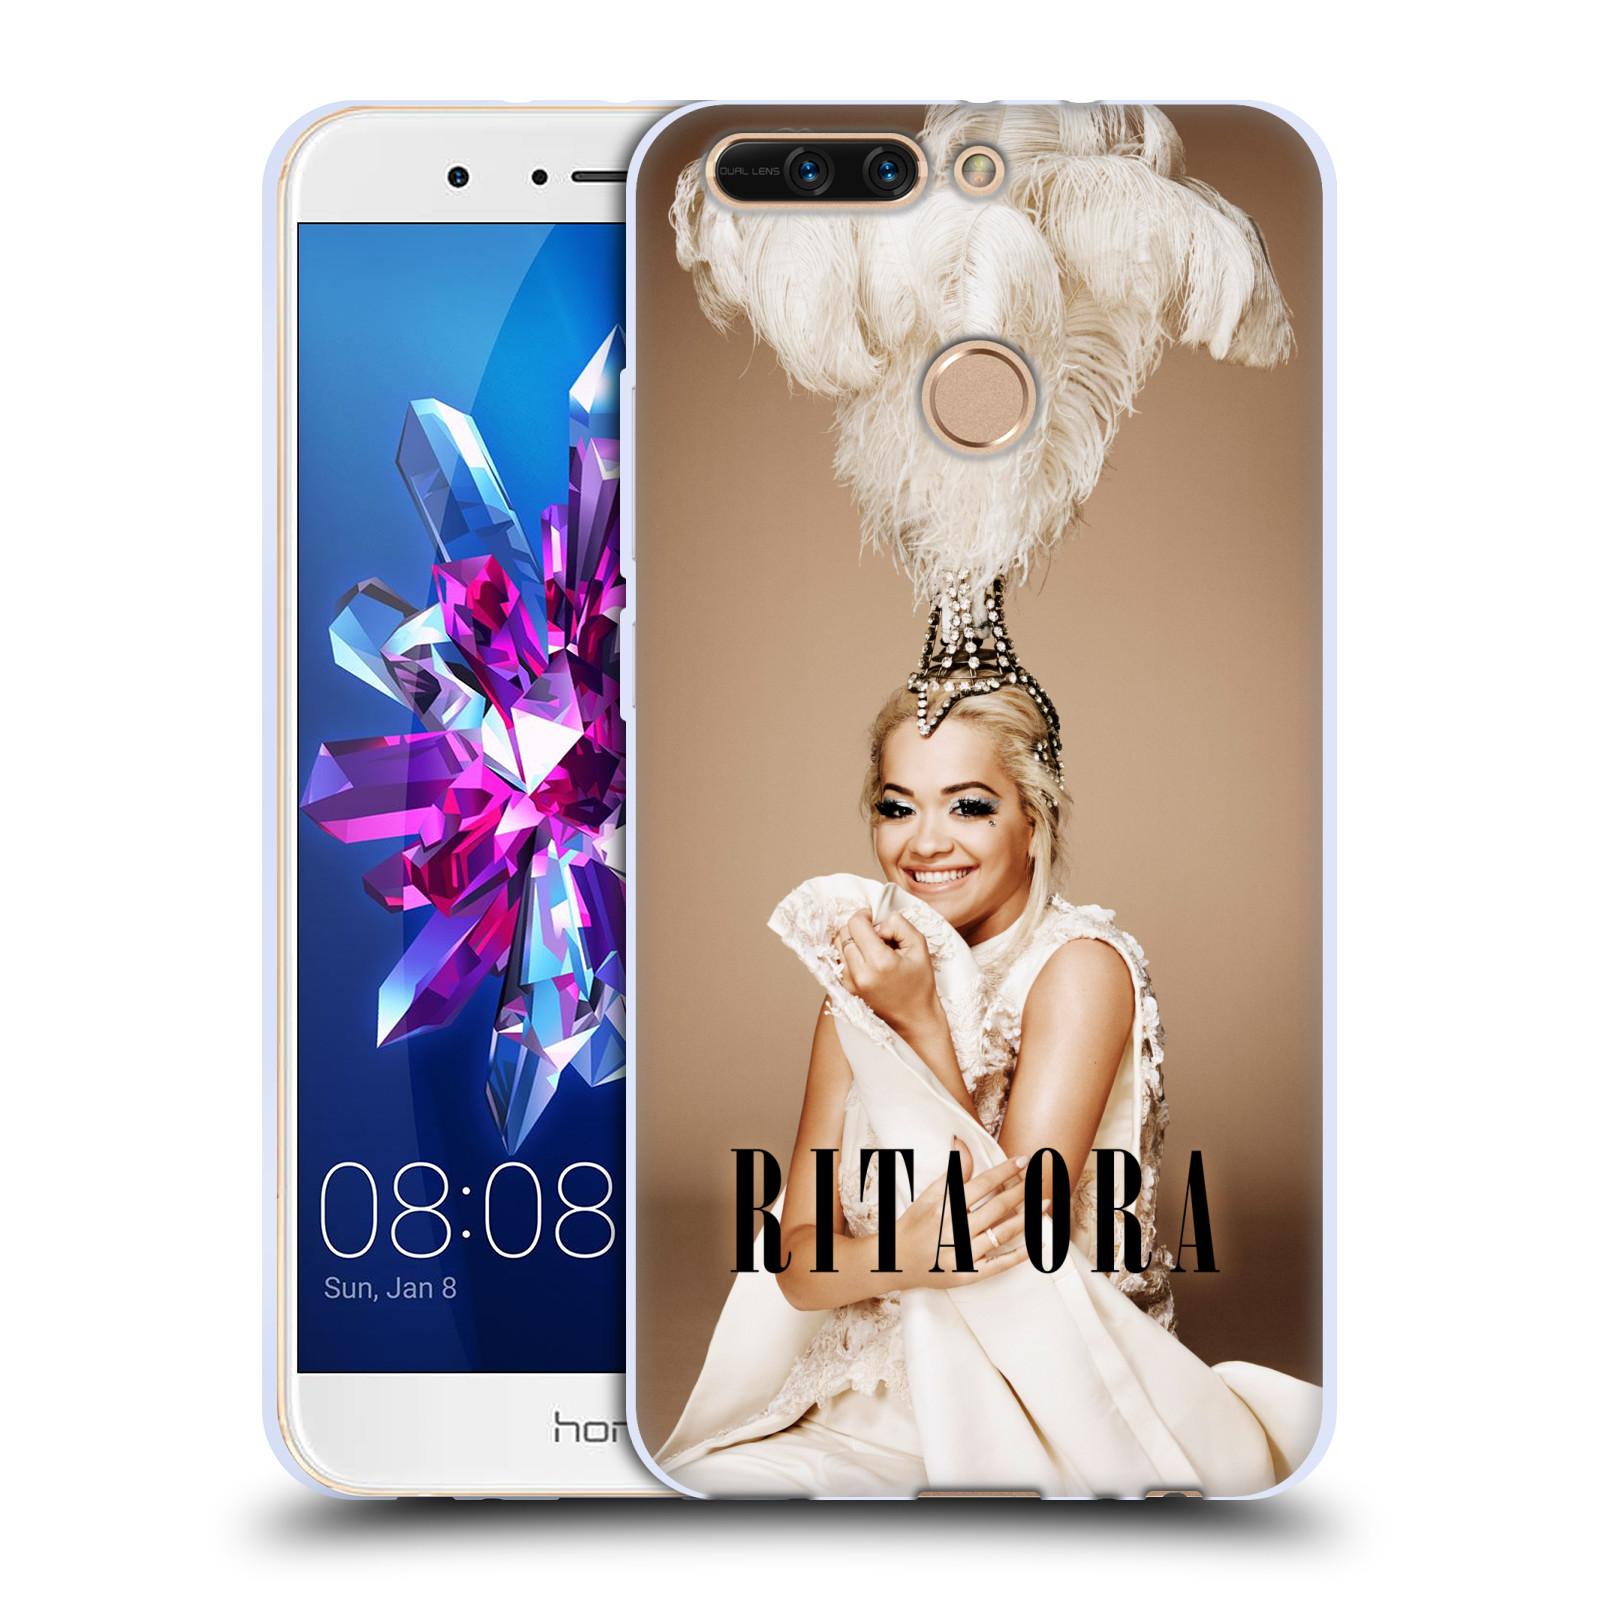 HEAD CASE silikonový obal na mobil Huawei HONOR 8 PRO / Honor 8 PRO DUAL SIM zpěvačka Rita Ora peří